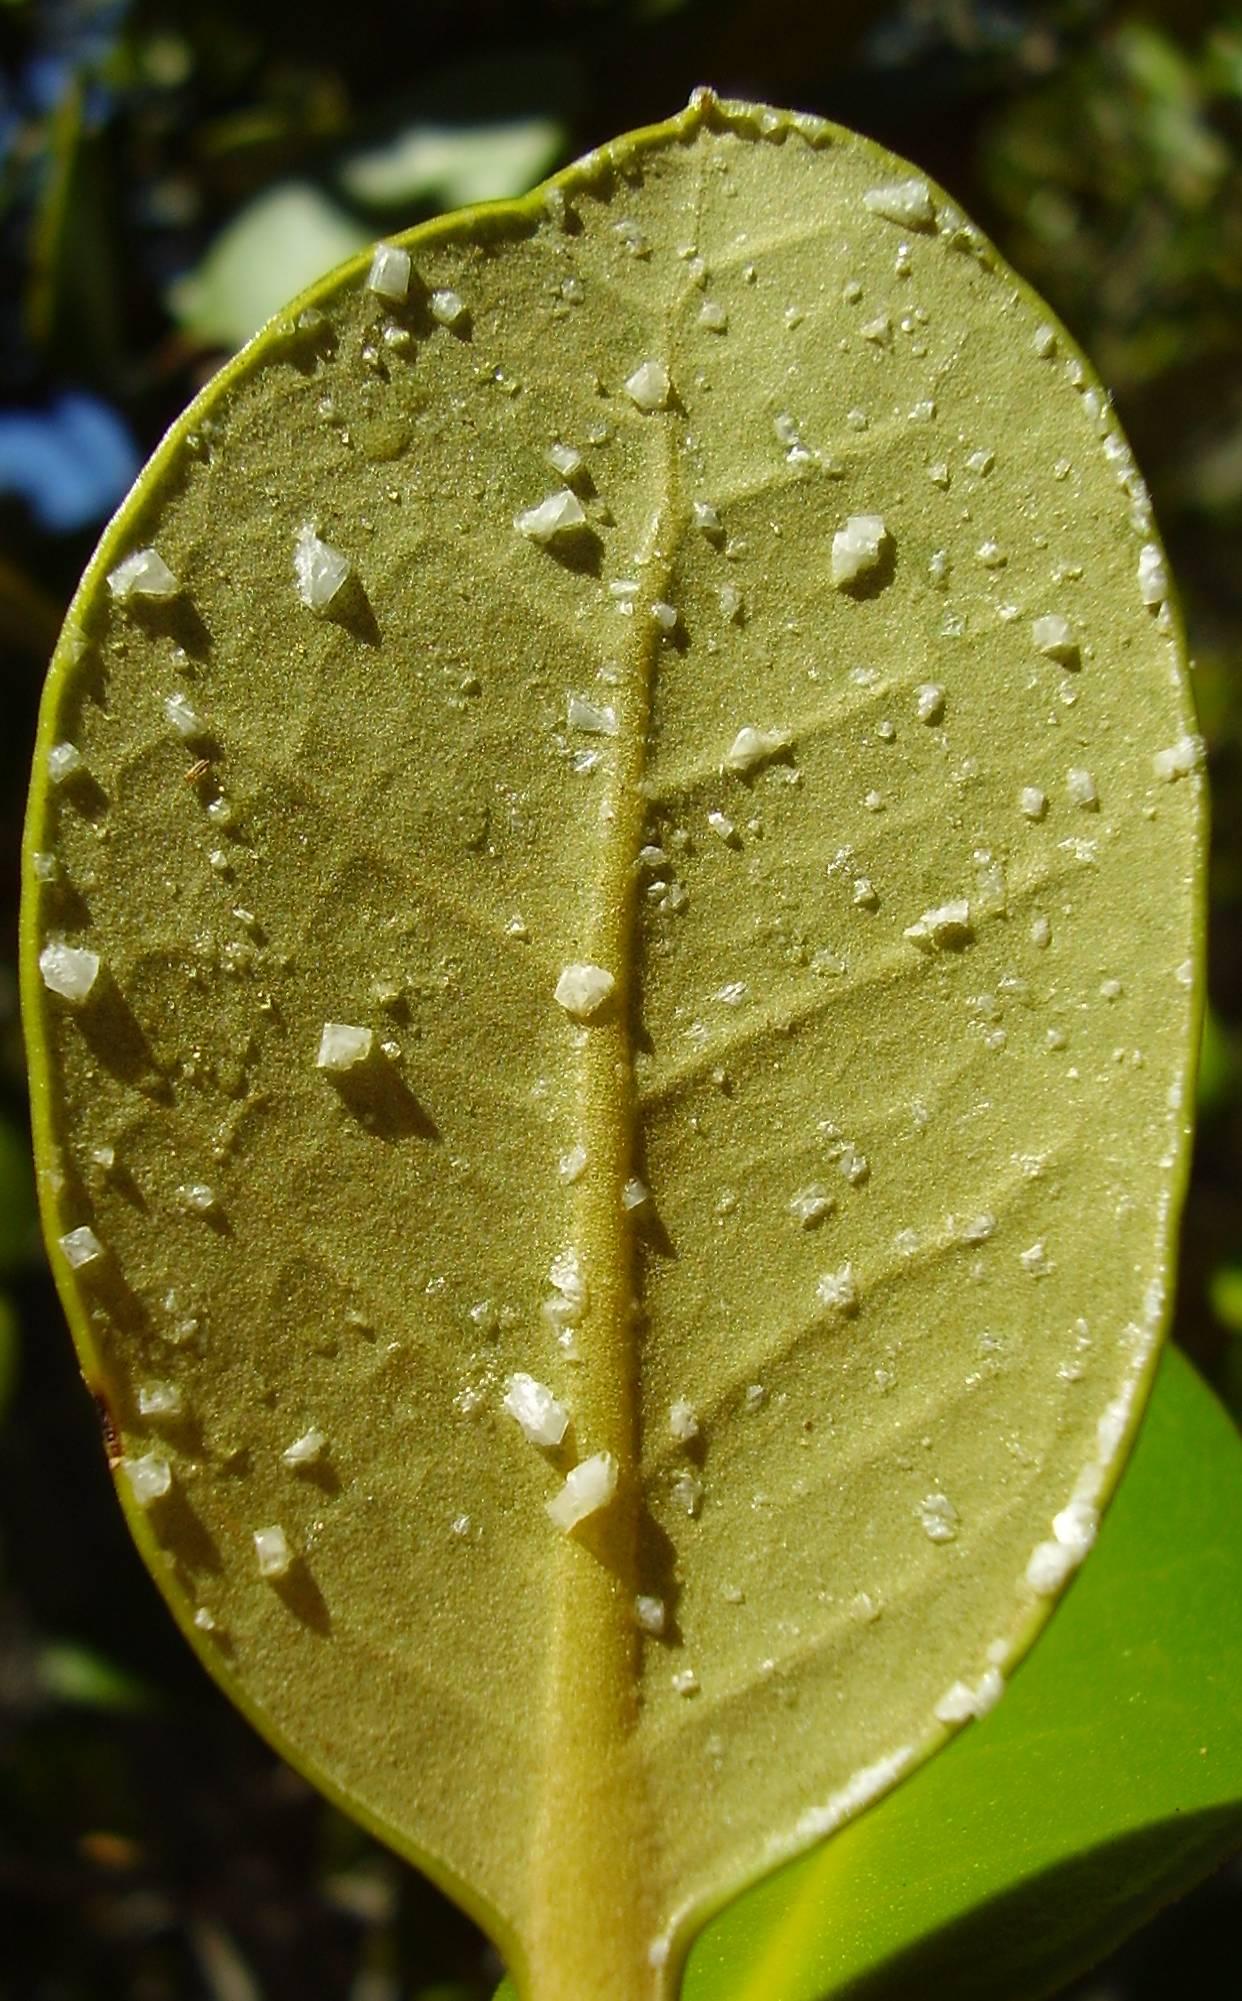 Did the Mangrove Tree De Salt Water